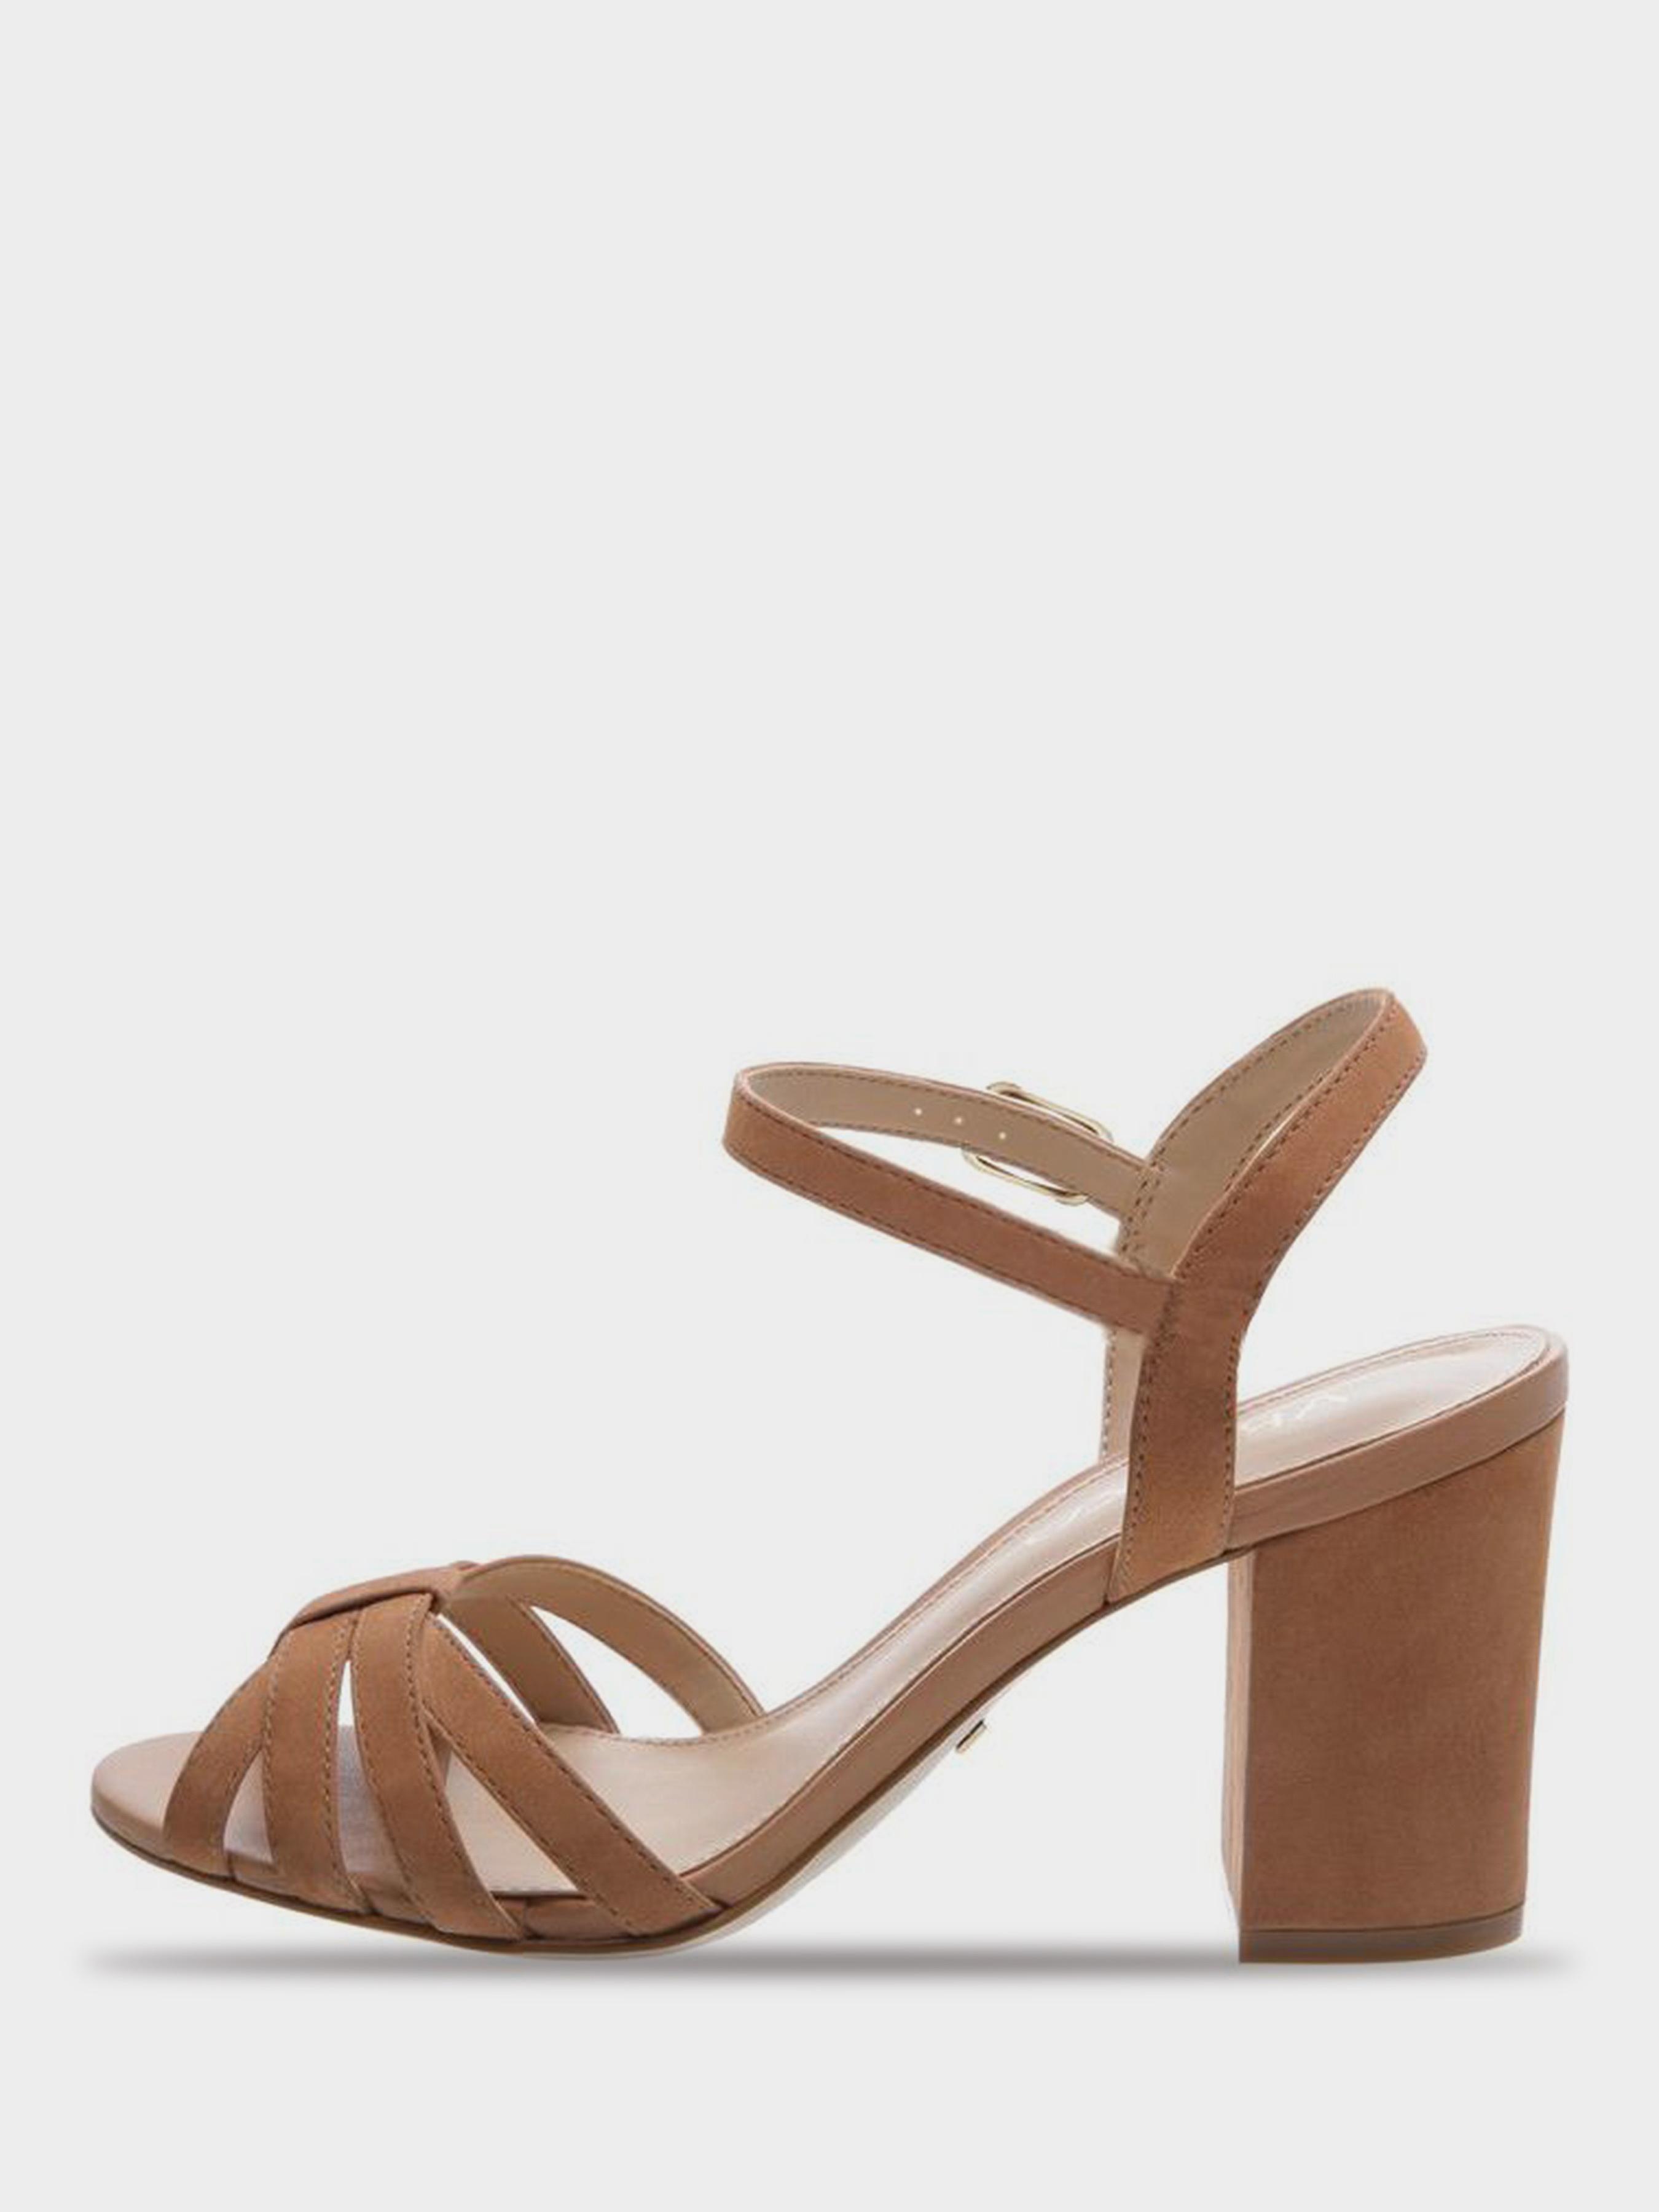 Босоножки для женщин Arezzo 5Z17 размерная сетка обуви, 2017